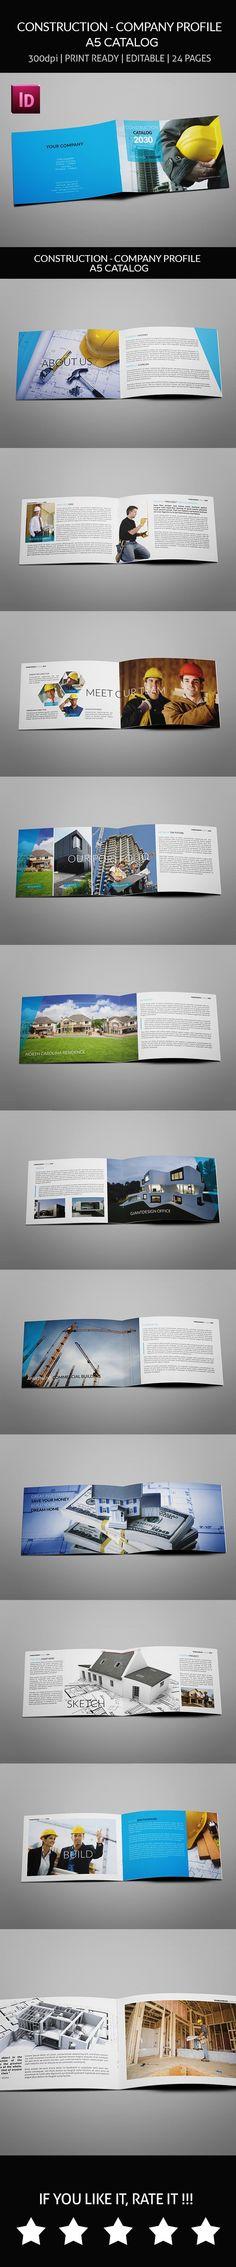 Company Profile Brochure Company profile, Brochure template and - company profile